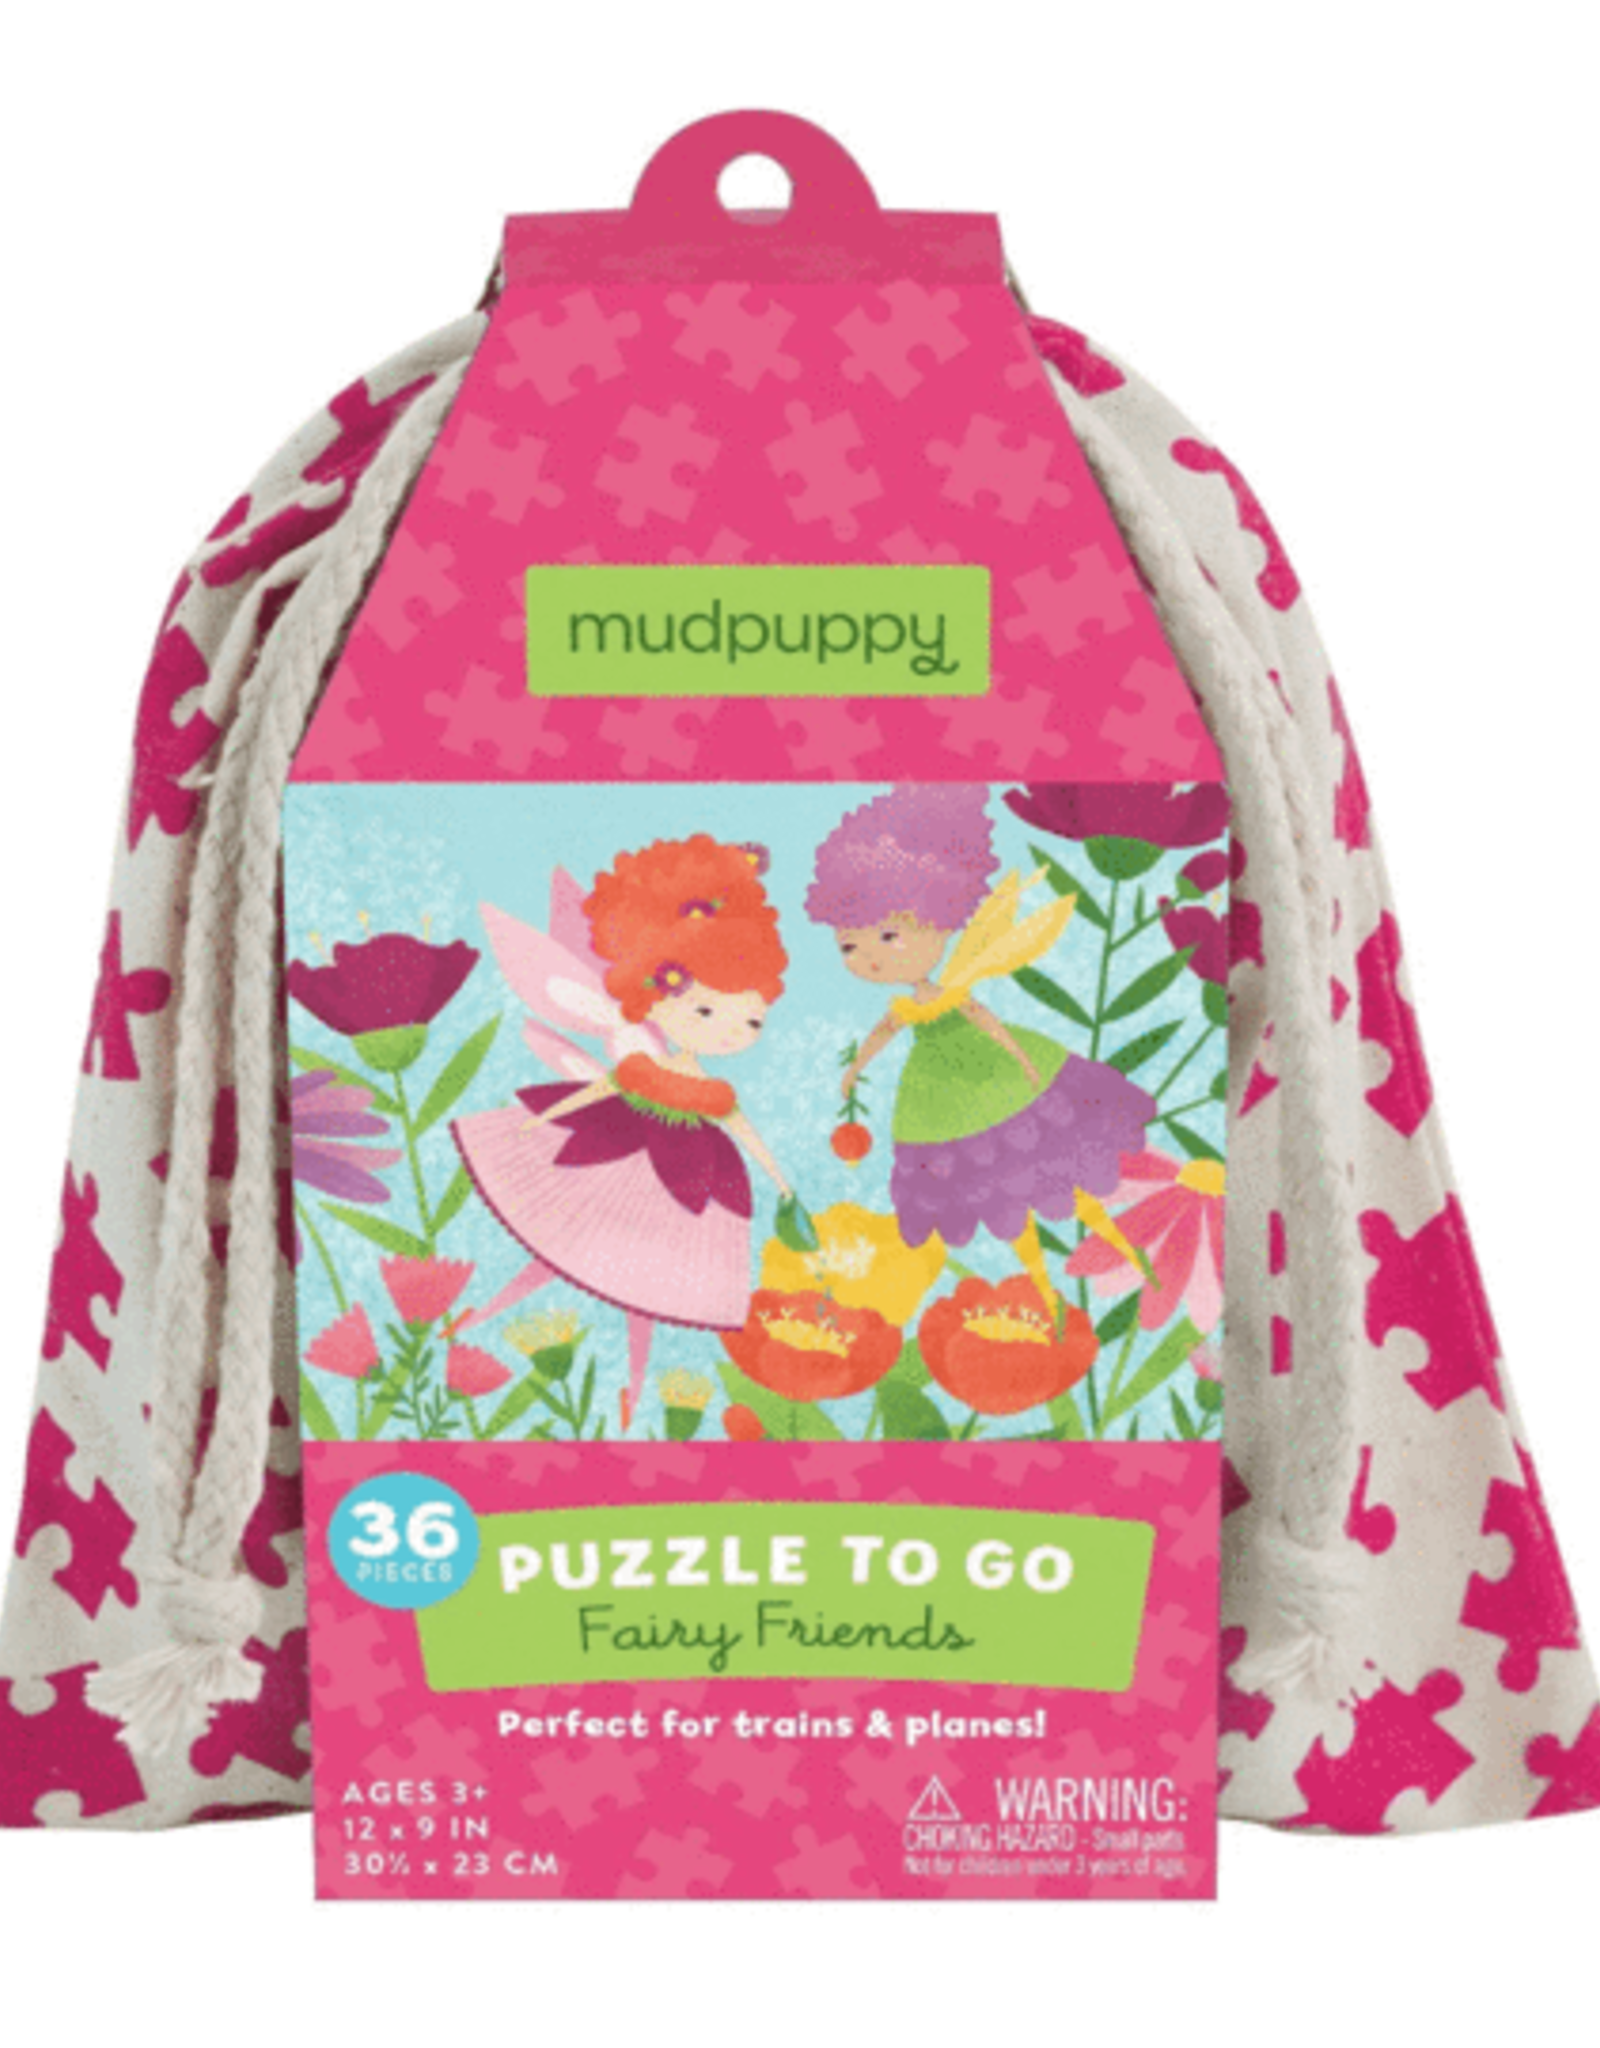 Mudpuppy Puzzle To Go Fairies